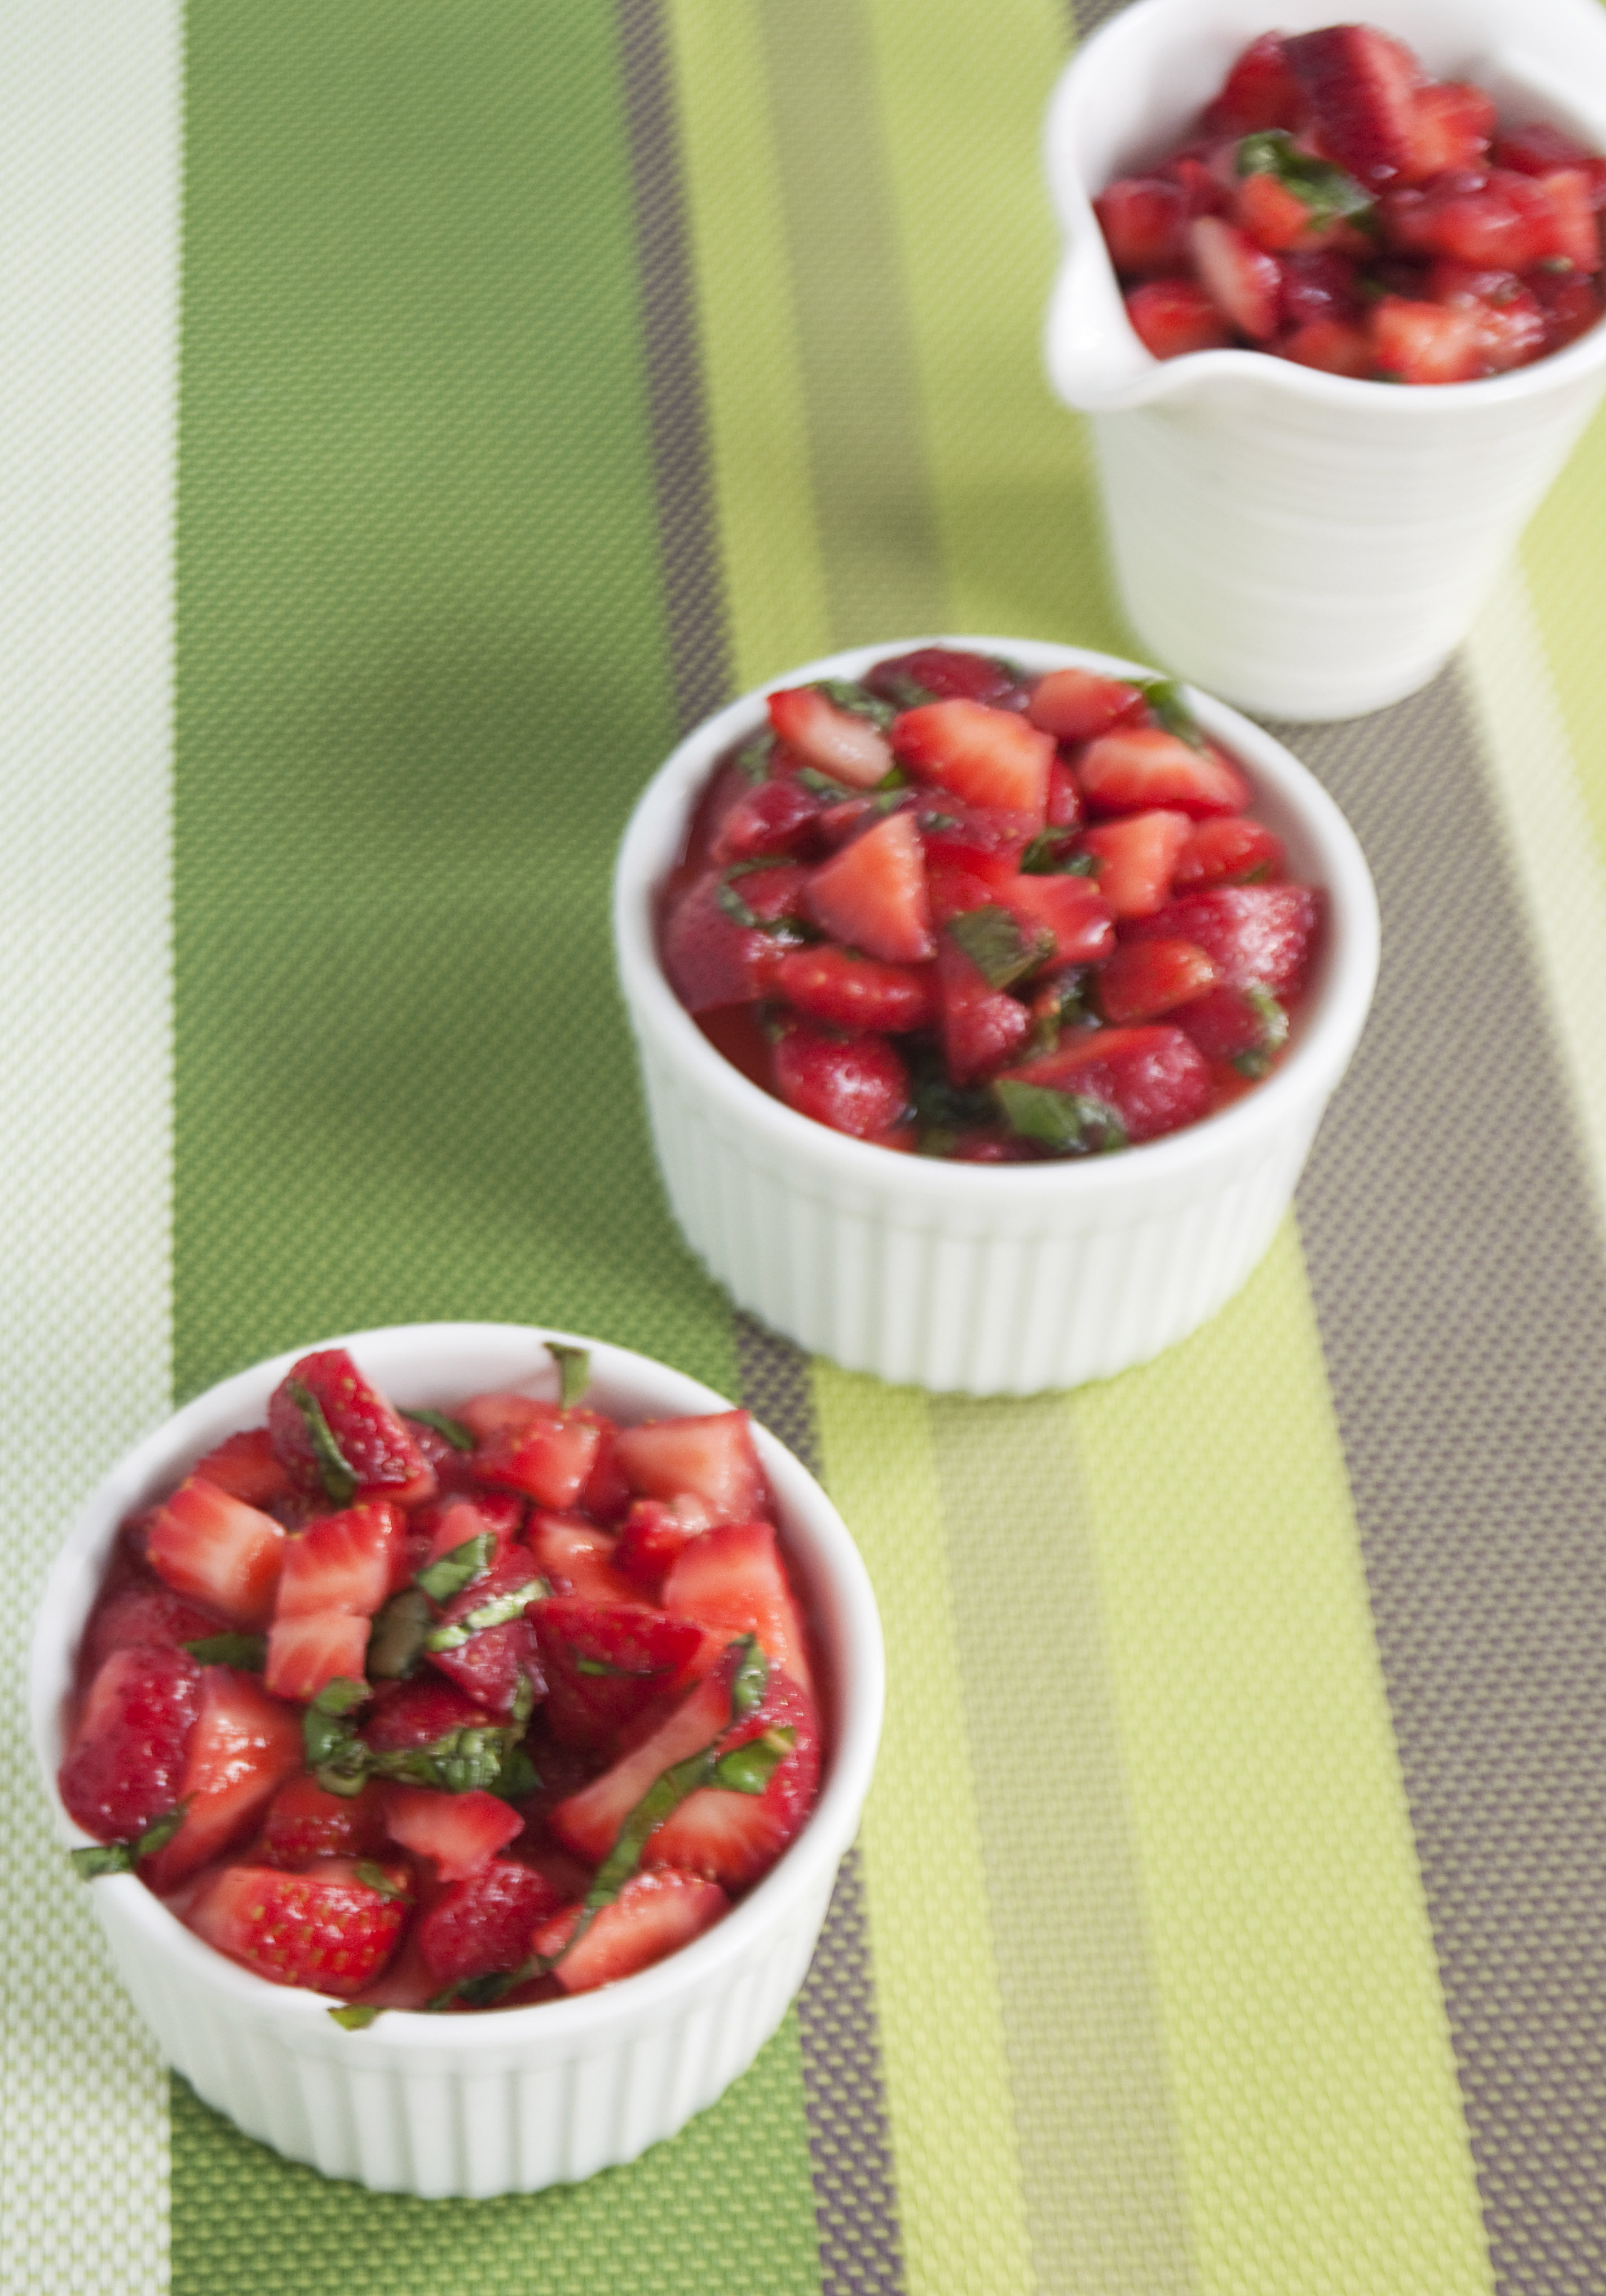 Lemon Basil Panna Cotta with Strawberries